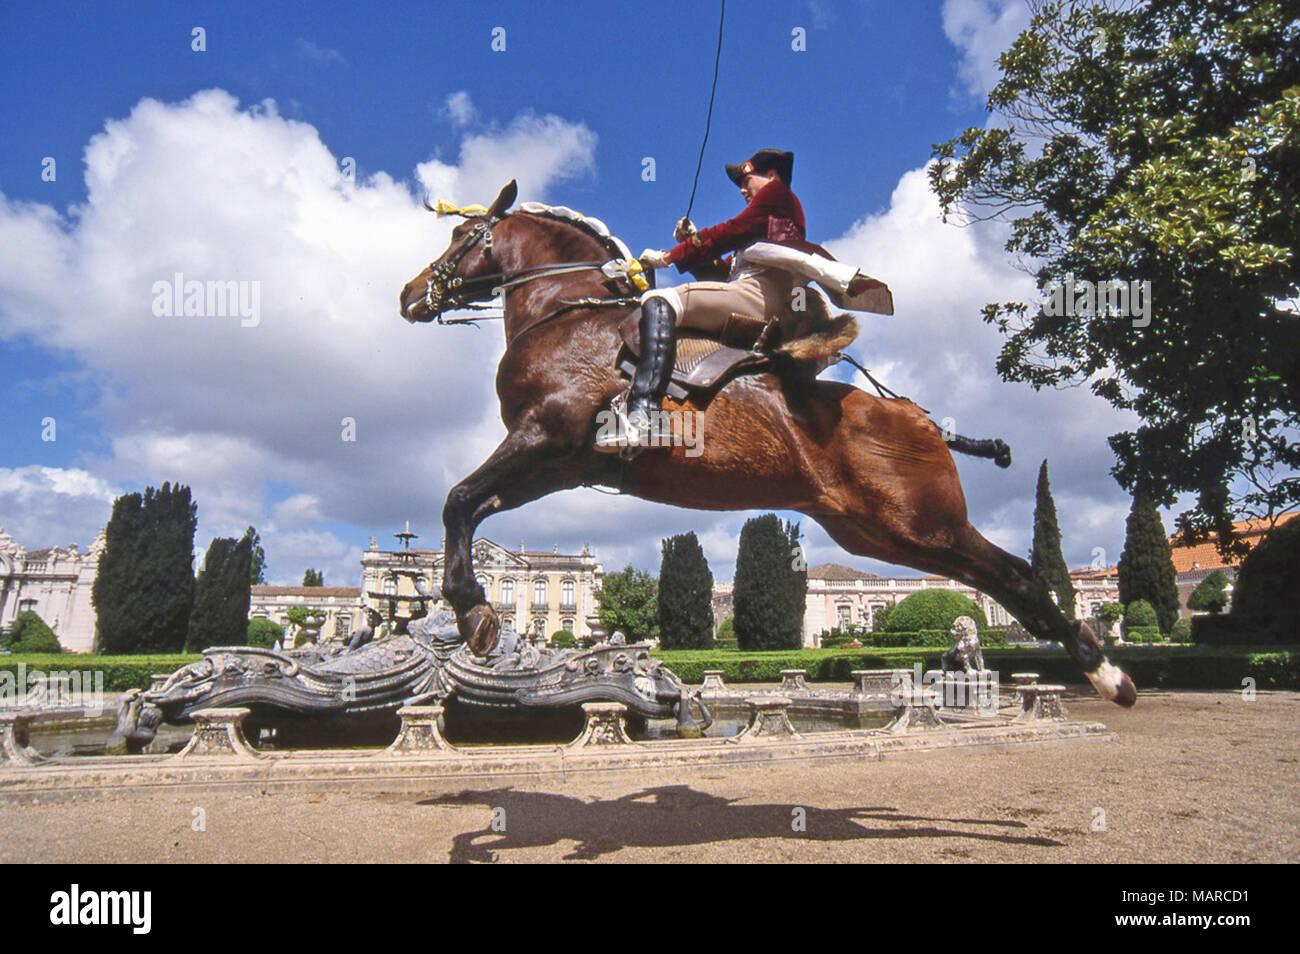 Alter Real. Bay Adult mit Reiter eine kapriole. Portugal Stockbild